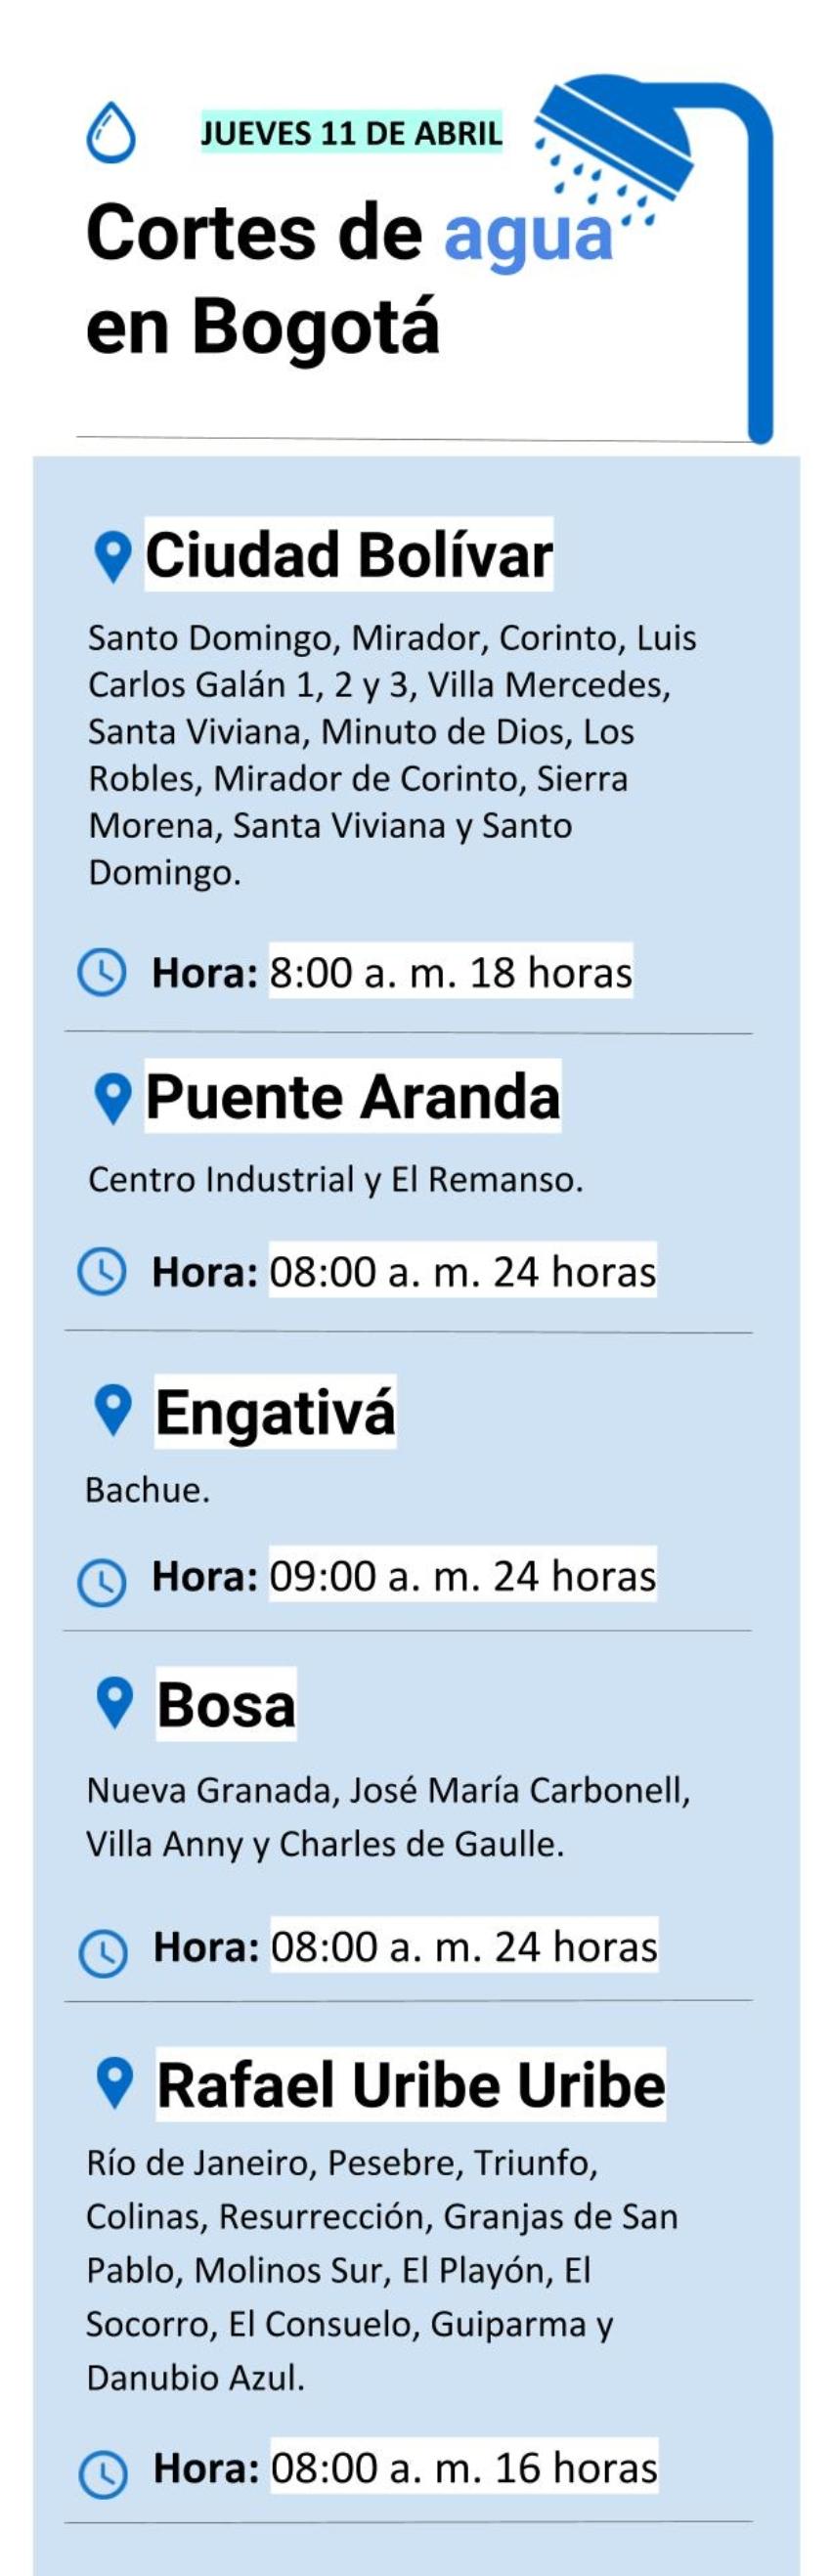 Cortes de agua en Bogotá jueves 11 de abril